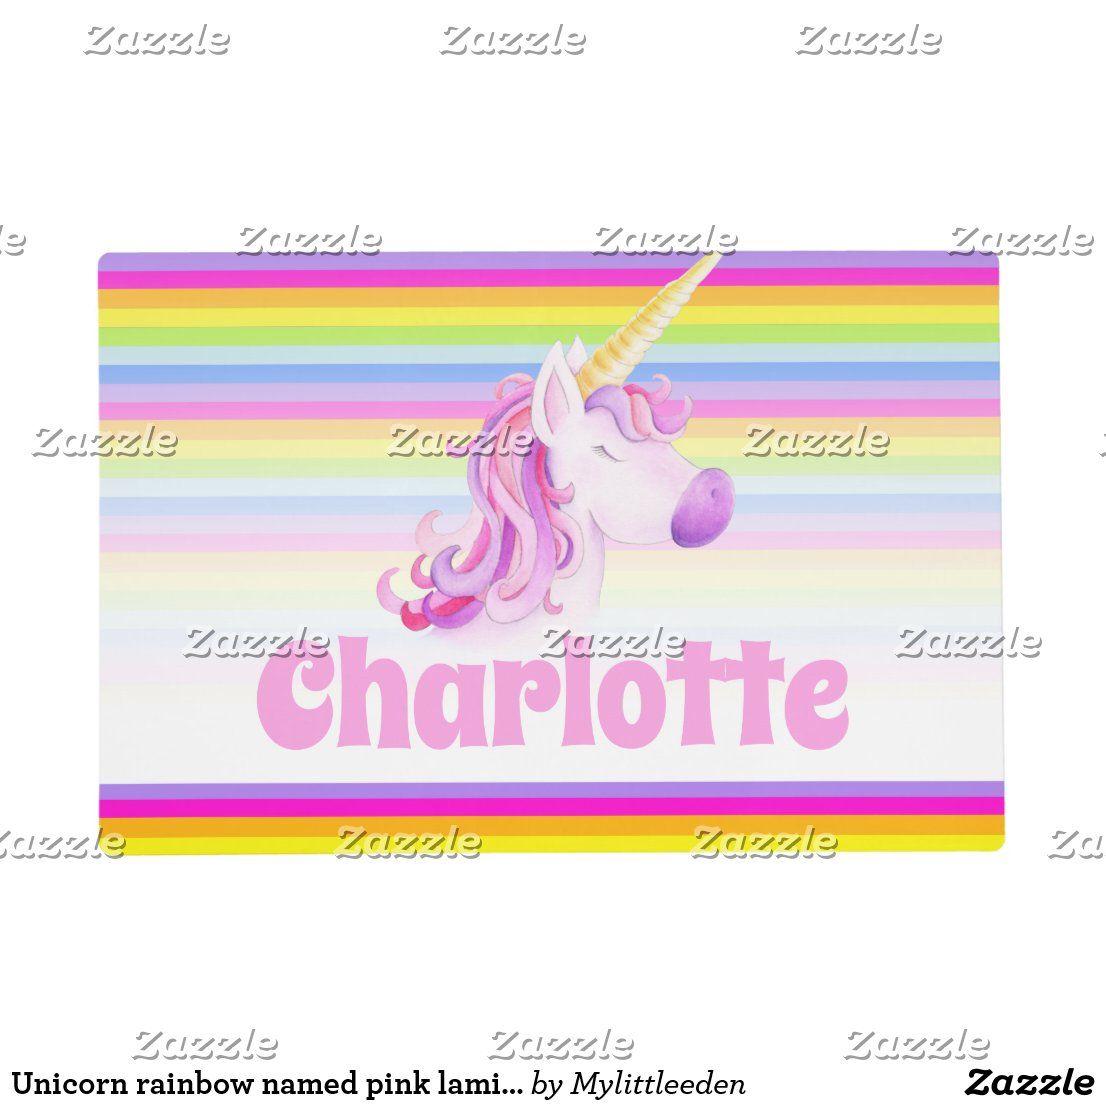 Unicorn rainbow named pink laminated placemat. Original watercolor art and design by Sarah Trett for www.mylittleeden.com #rainbowunicorns #unicorns #kidsplacemat #placemat #mats #keepitclean